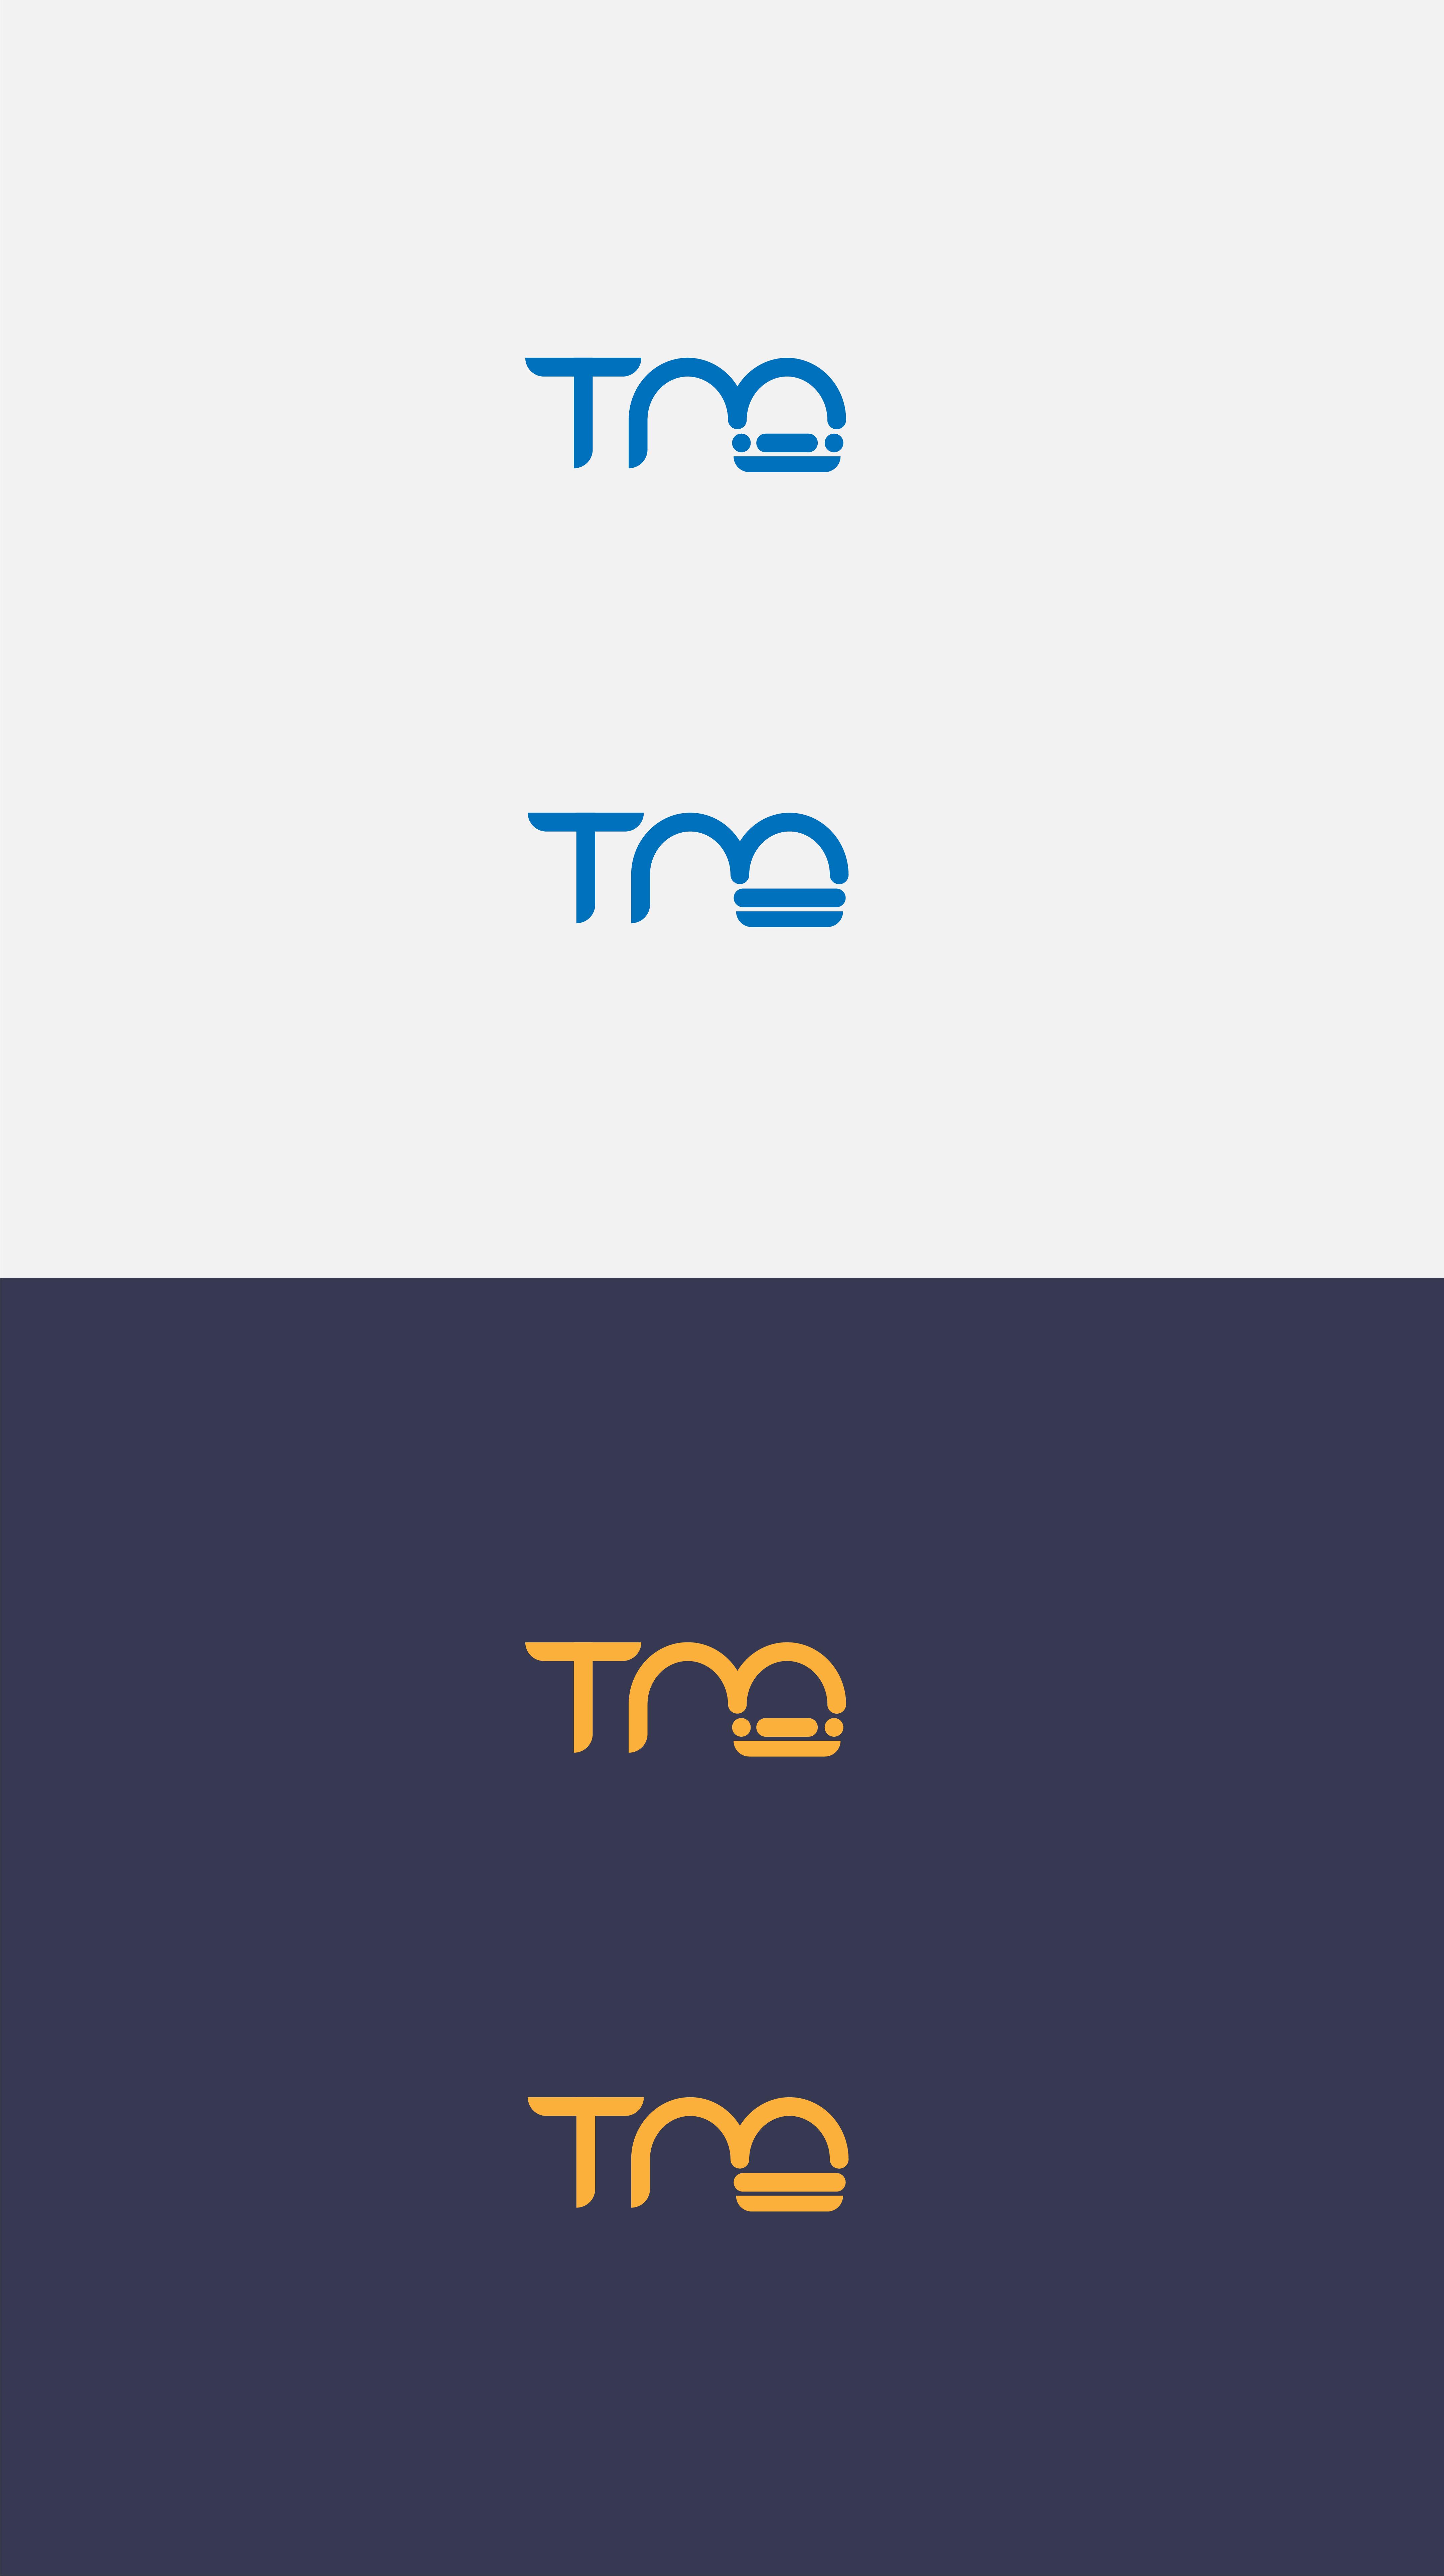 Разработка логотипа фото f_577597b612bee89d.jpg